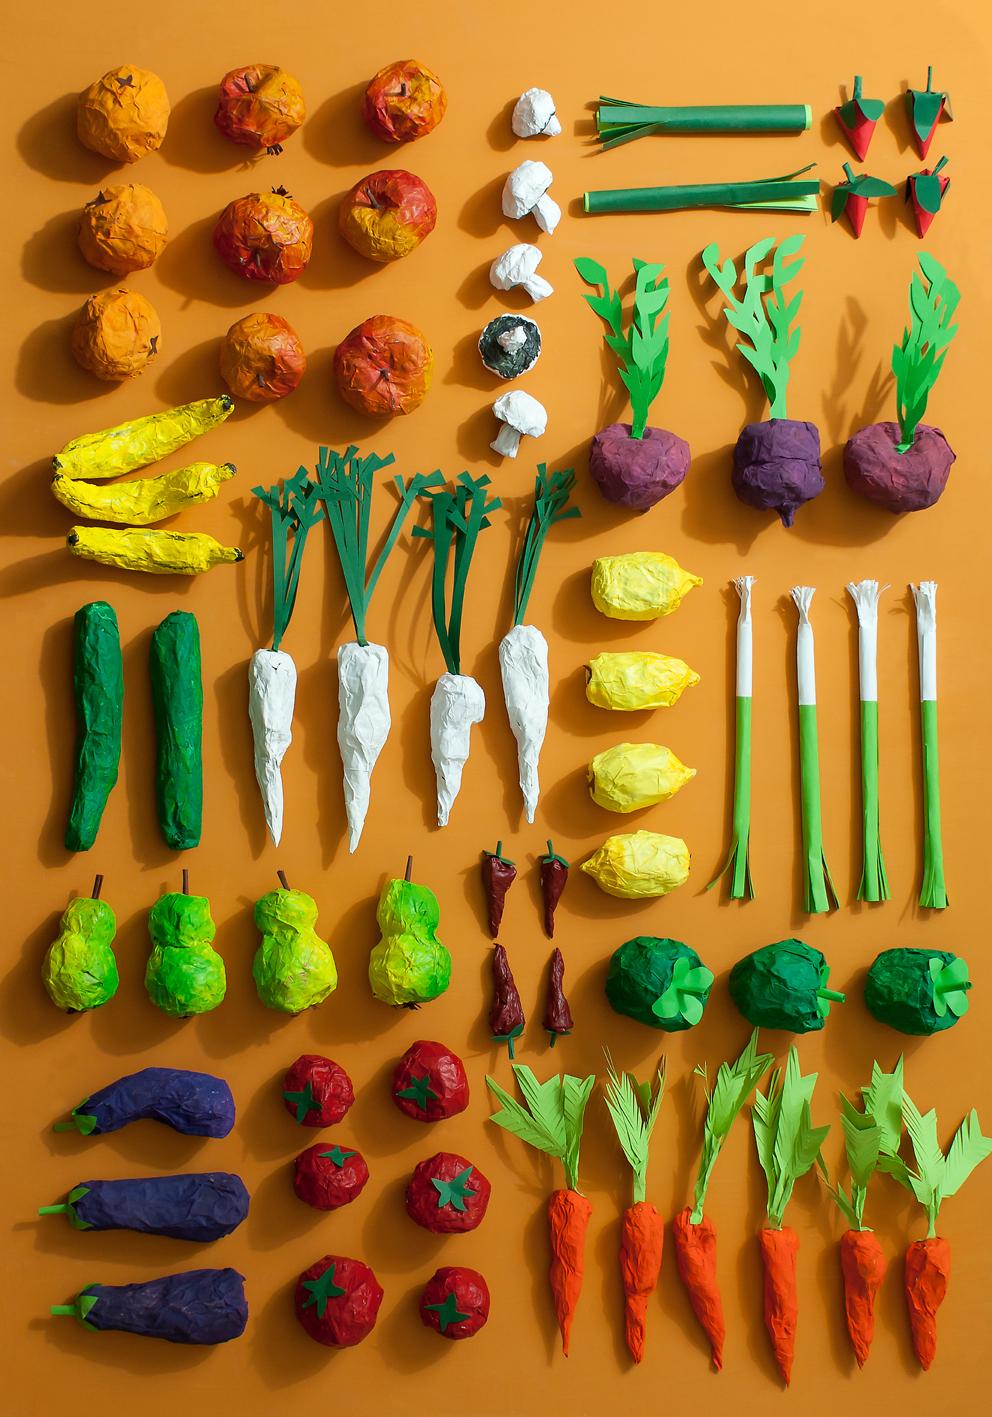 WRK_Graphicdesign_Tactile_Illustration_Papercraft_Businesspunk_YUMMY_Dossier_vegetables_fruits_Andrea_Weber_Damoun_Tamir.jpg